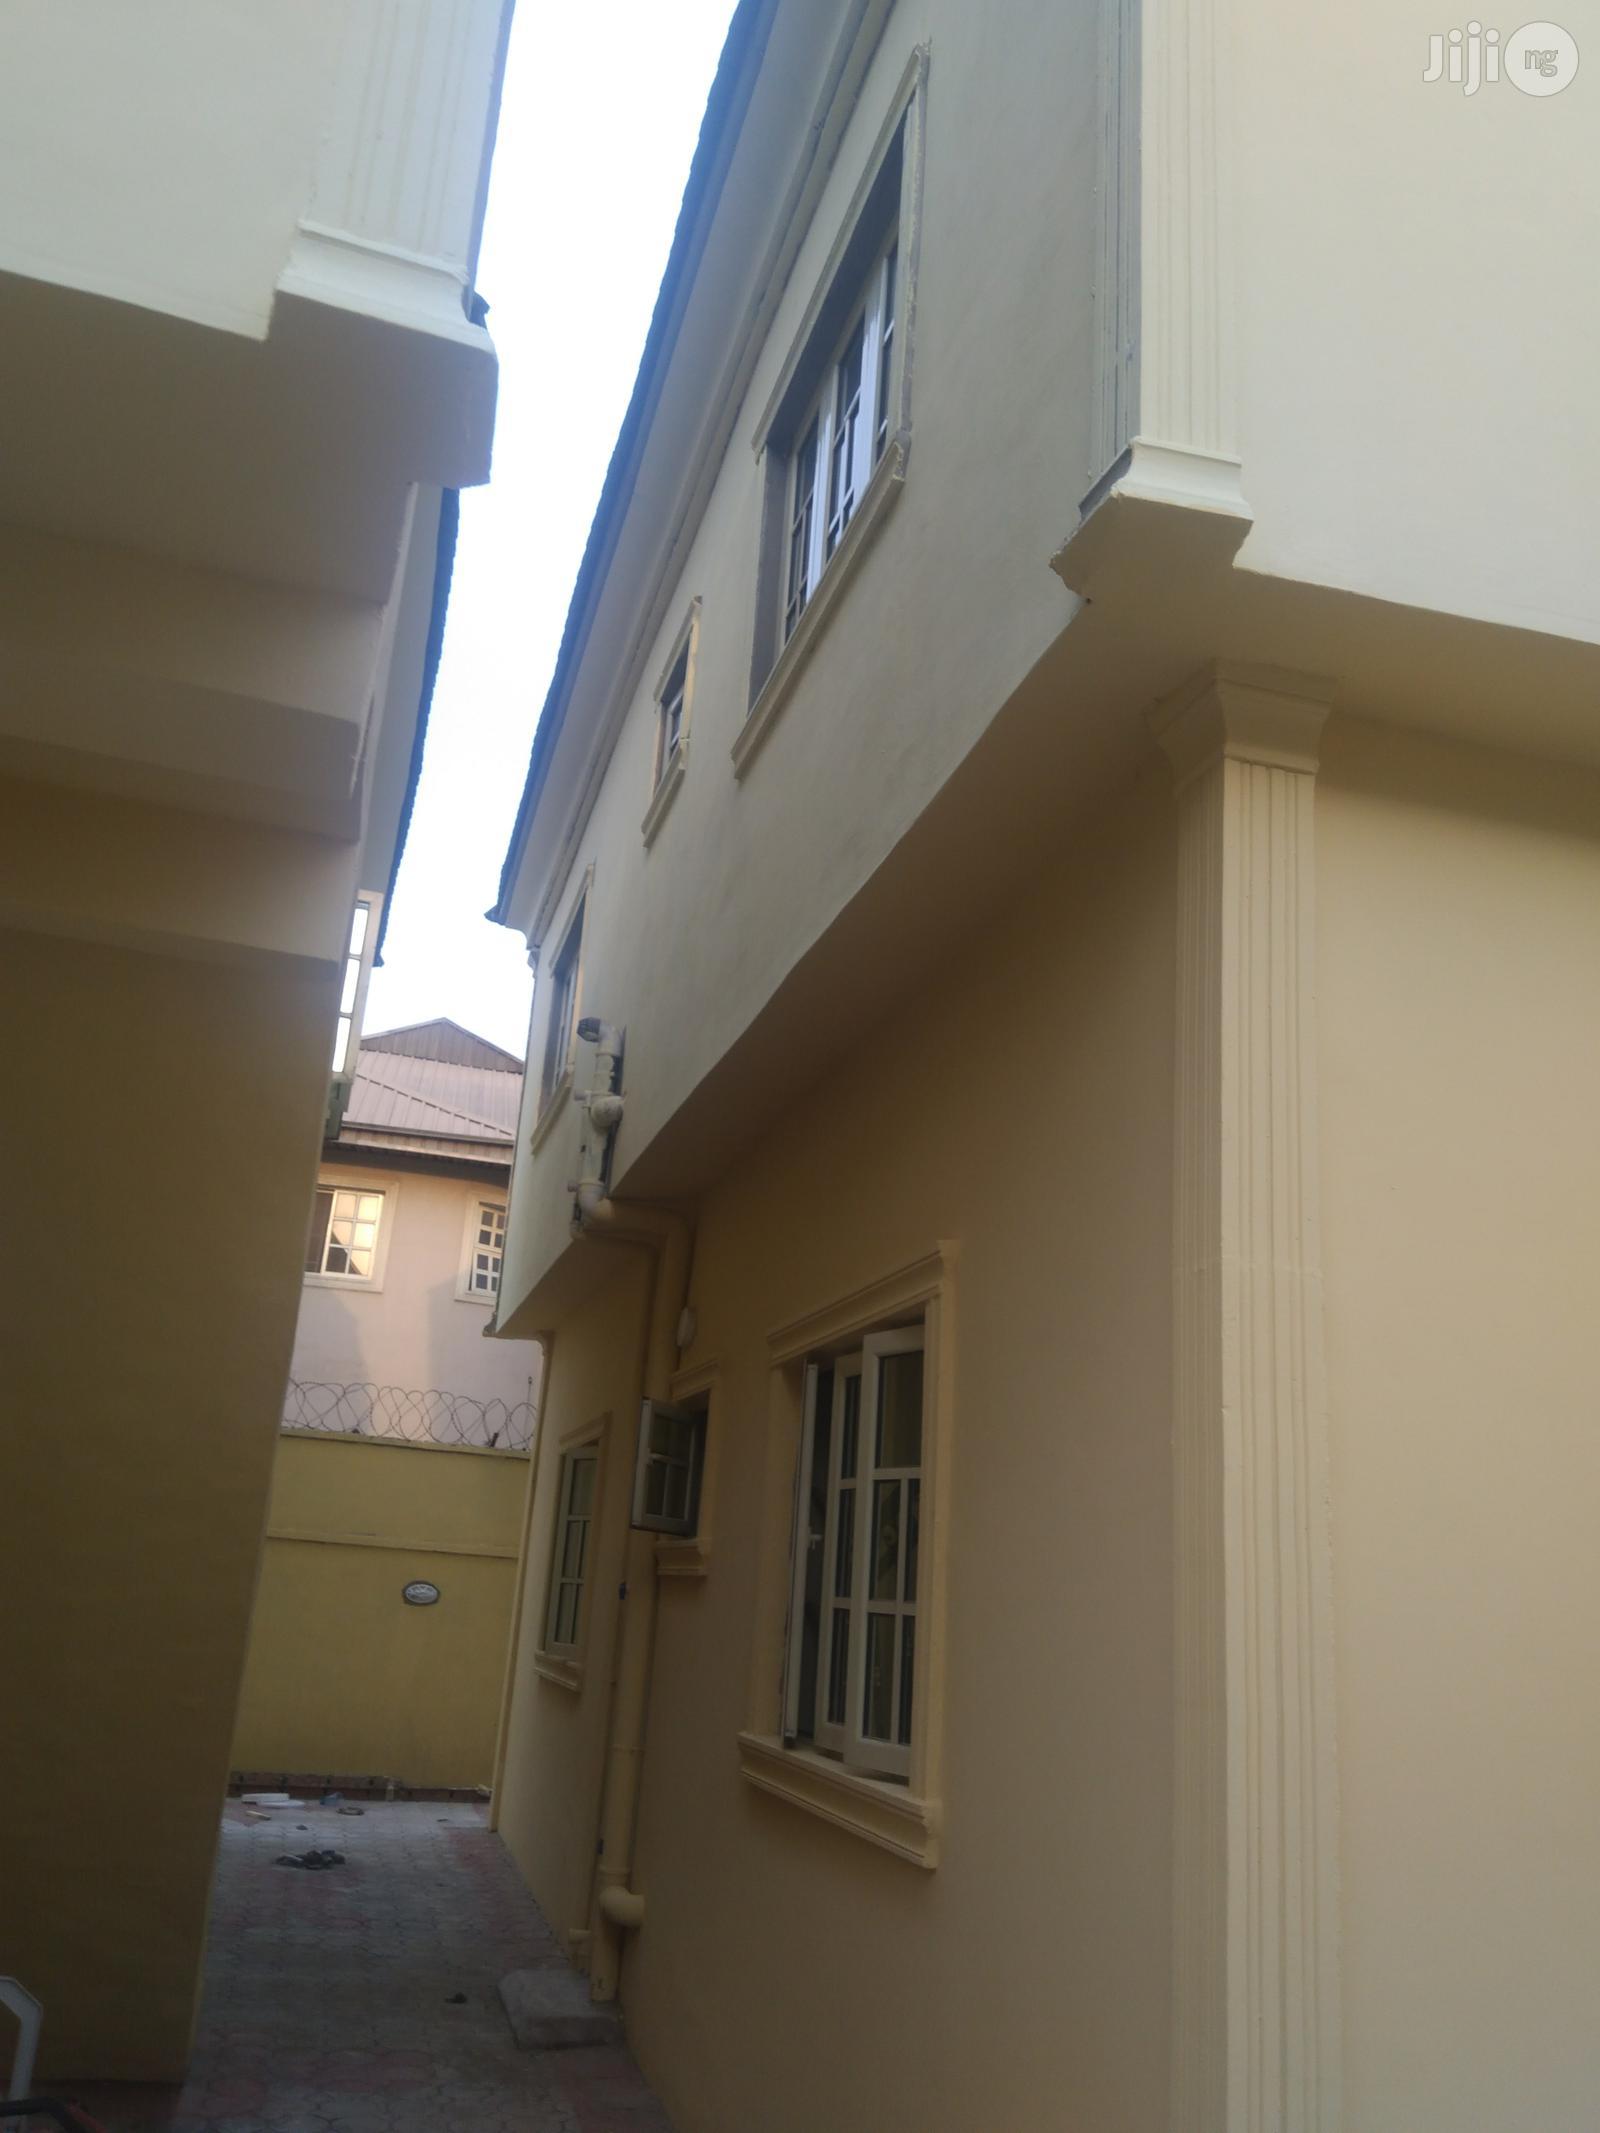 To Let Executive 2bedroom Flat Kfarm Estate | Houses & Apartments For Rent for sale in Ifako-Ijaiye, Lagos State, Nigeria